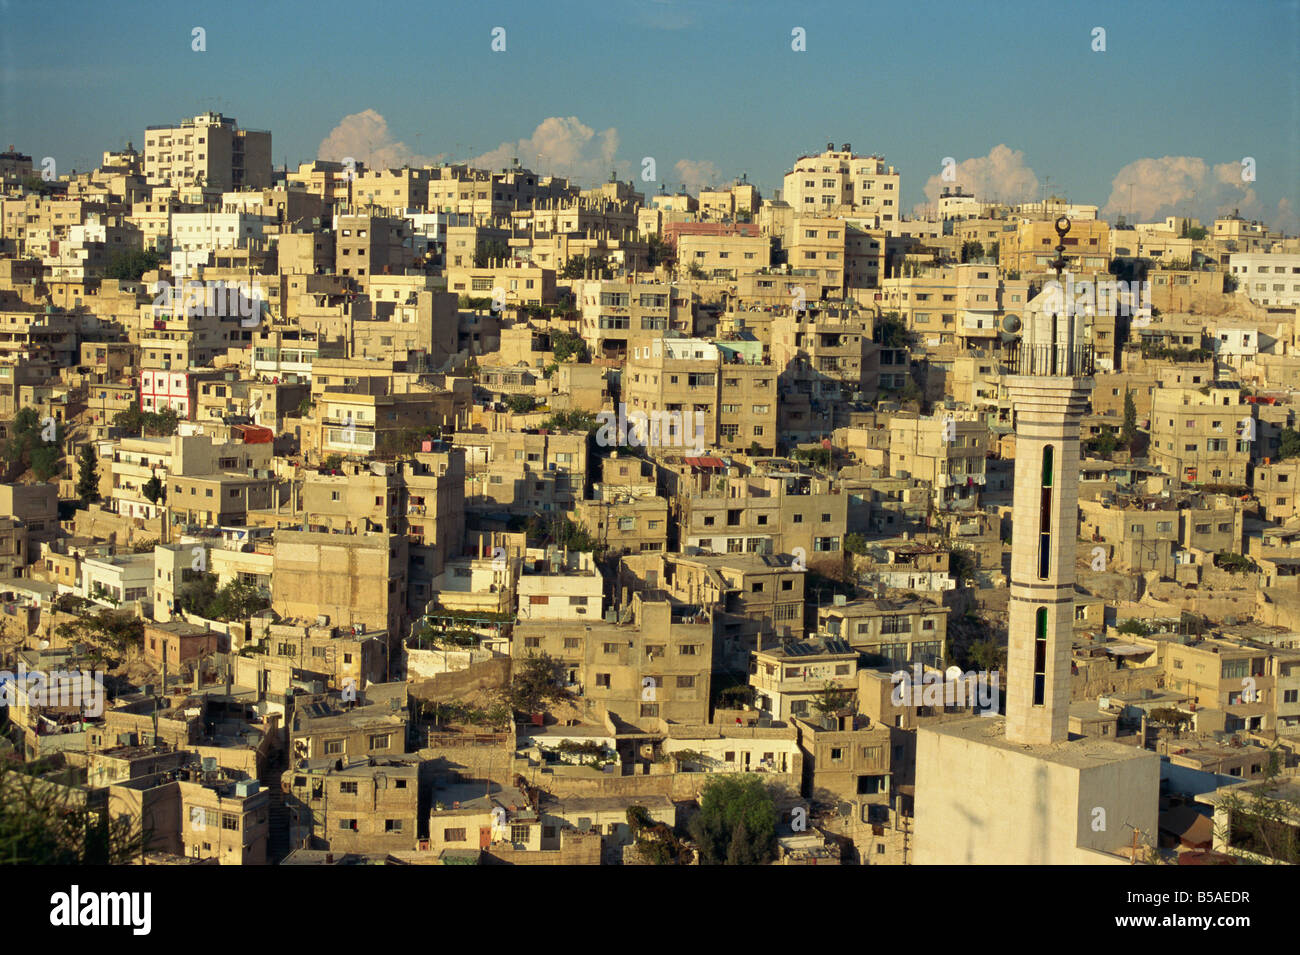 Veduta aerea di Jebel Alqala'a, Amman, Giordania, Medio Oriente Immagini Stock